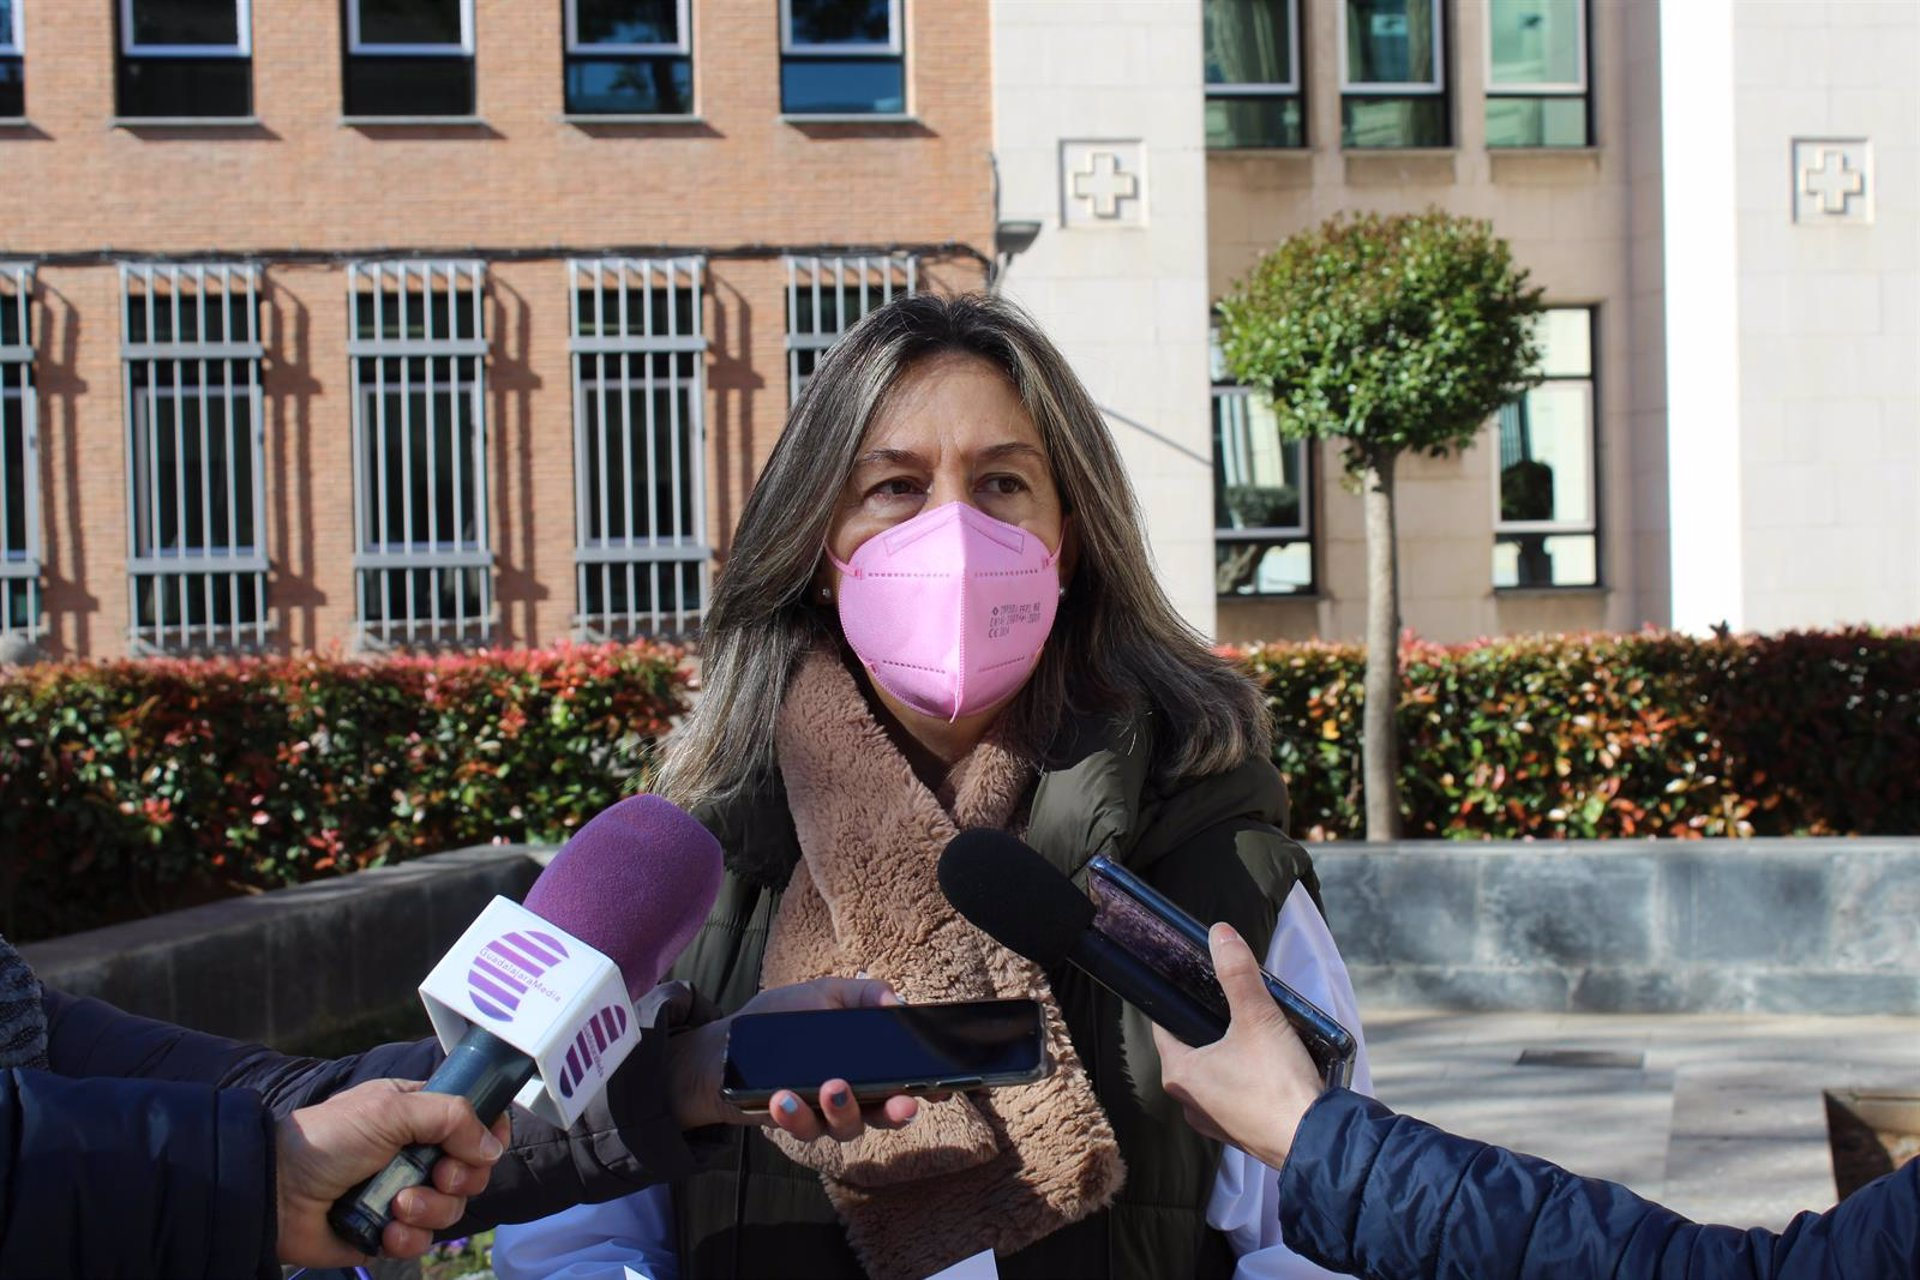 La diputada regional del PP por la provincia de Guadalajara, Ana Guarinos.